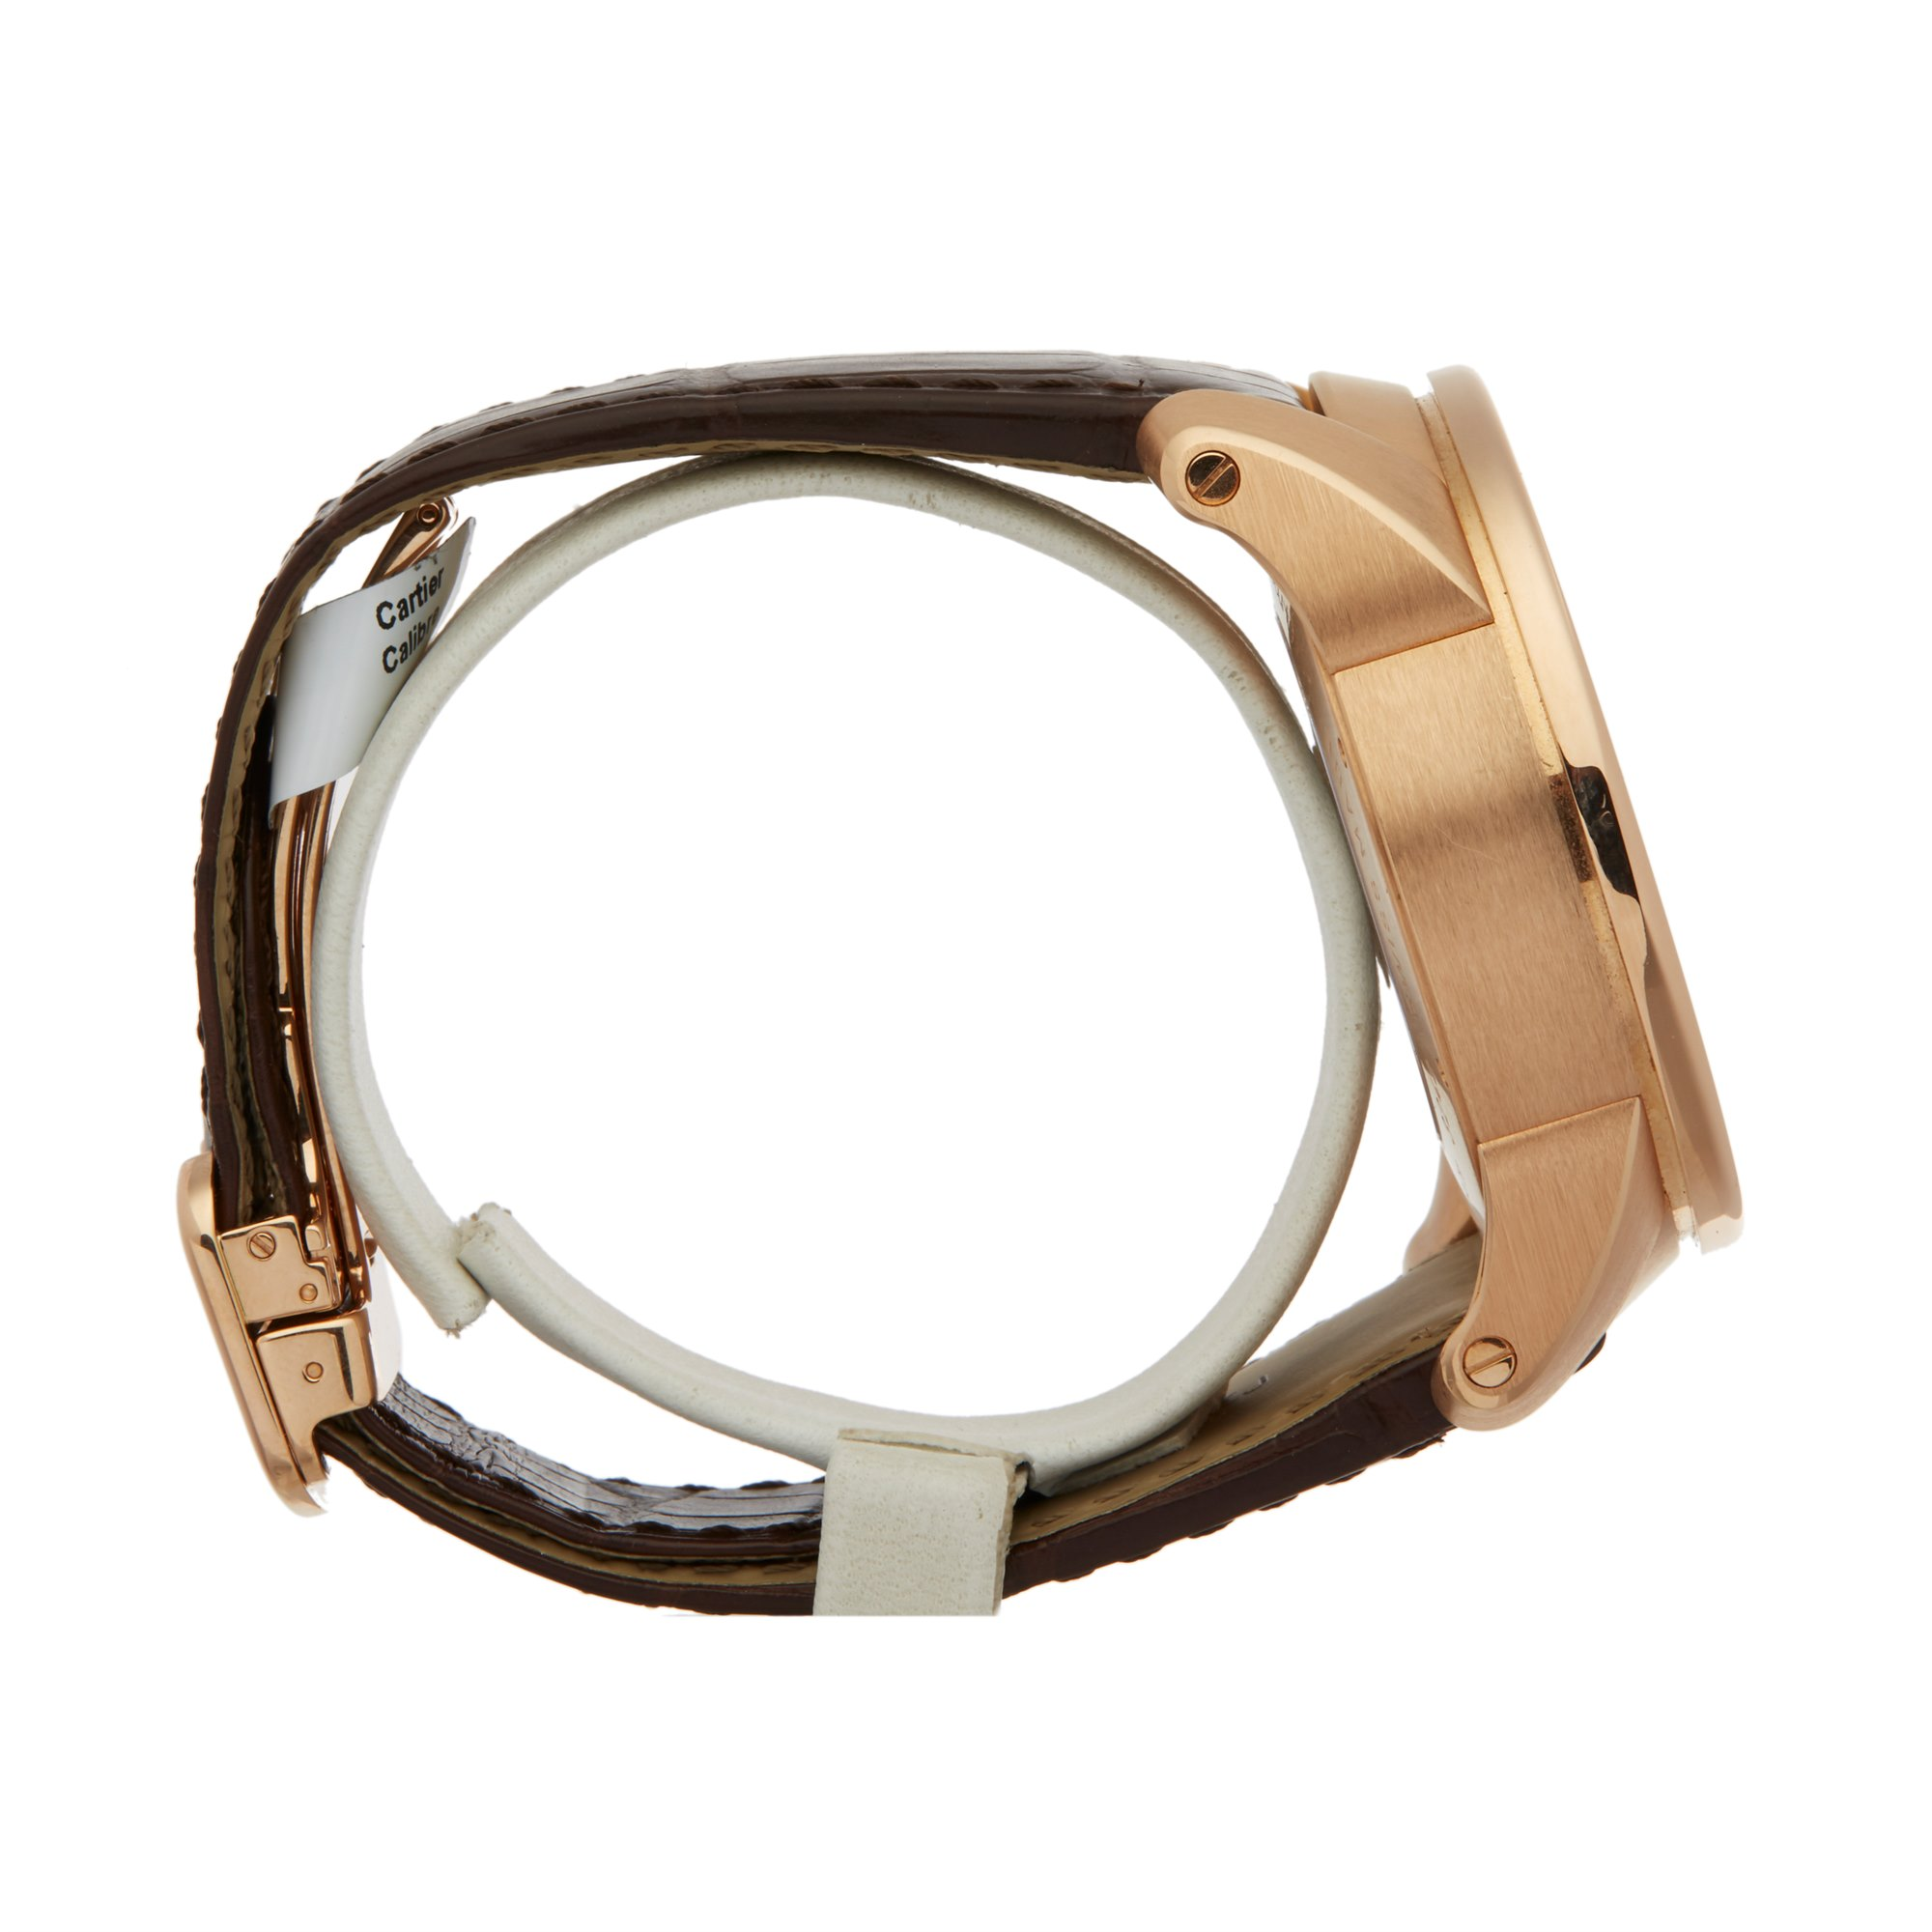 Lot 24 - Cartier Calibre W7100004 or 3242 Men Rose Gold Central Chronograph Watch